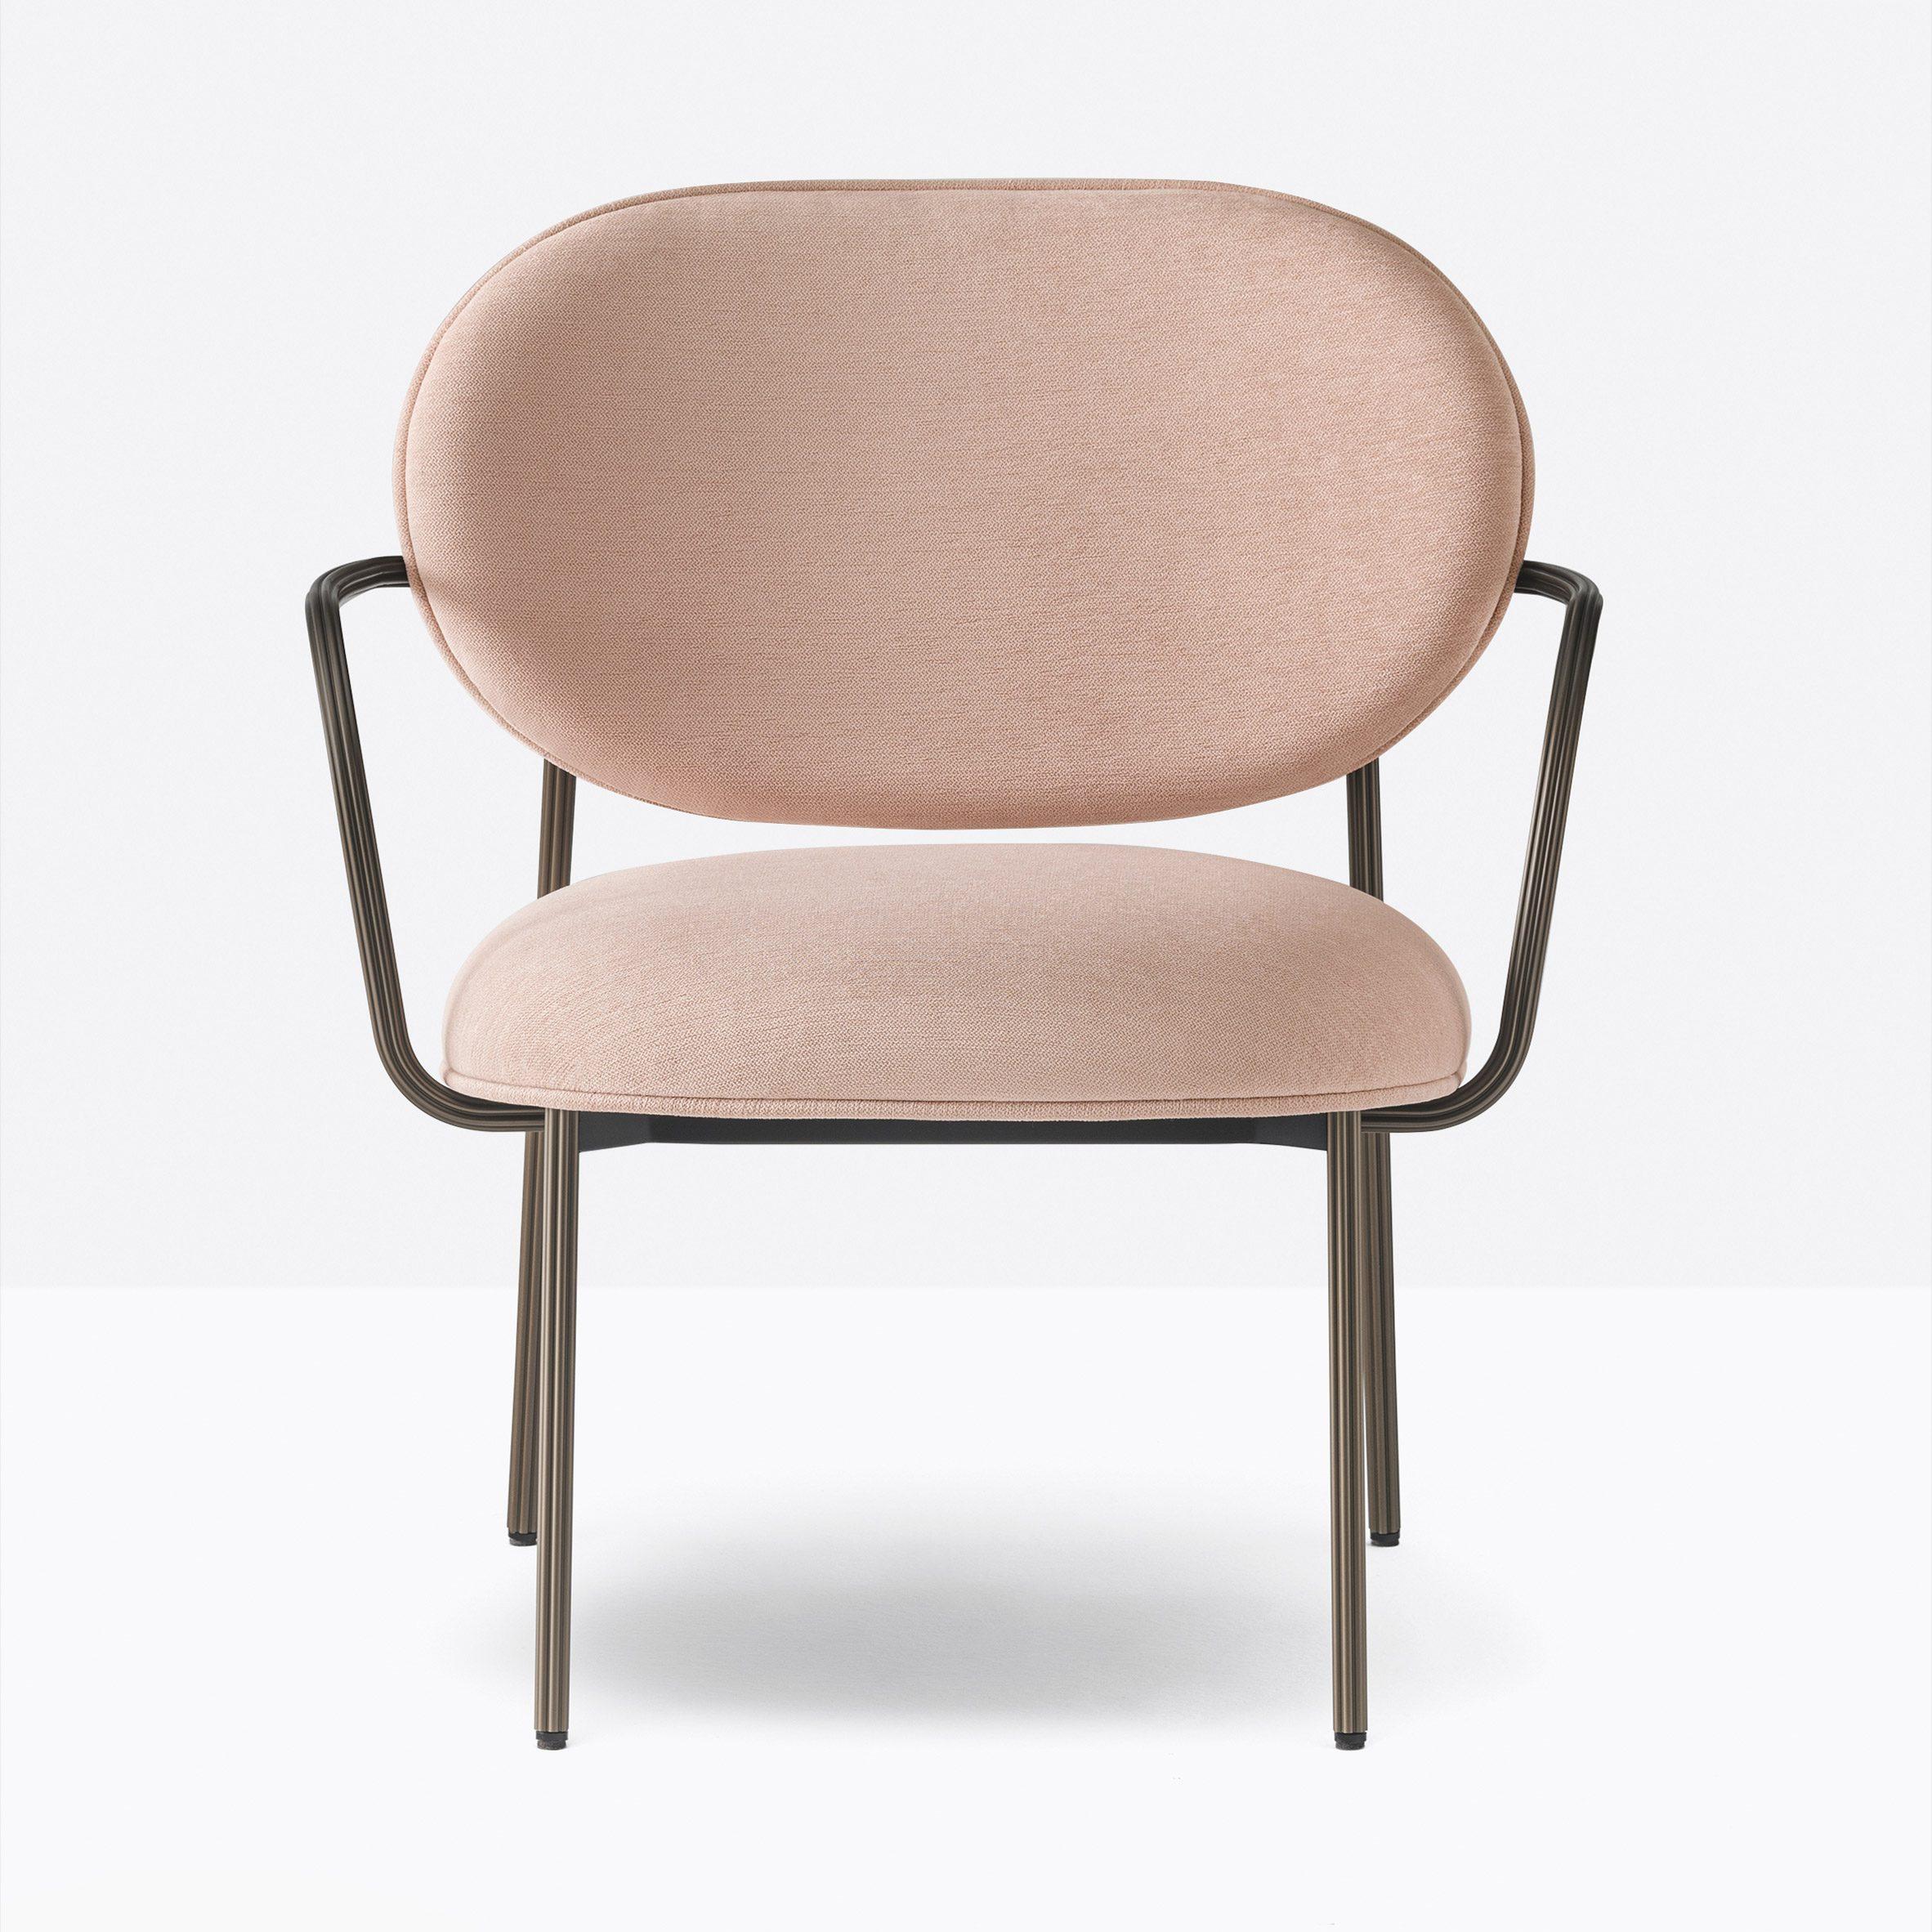 Blume lounge armchair by Sebastian Herkner for Pedrali in pink